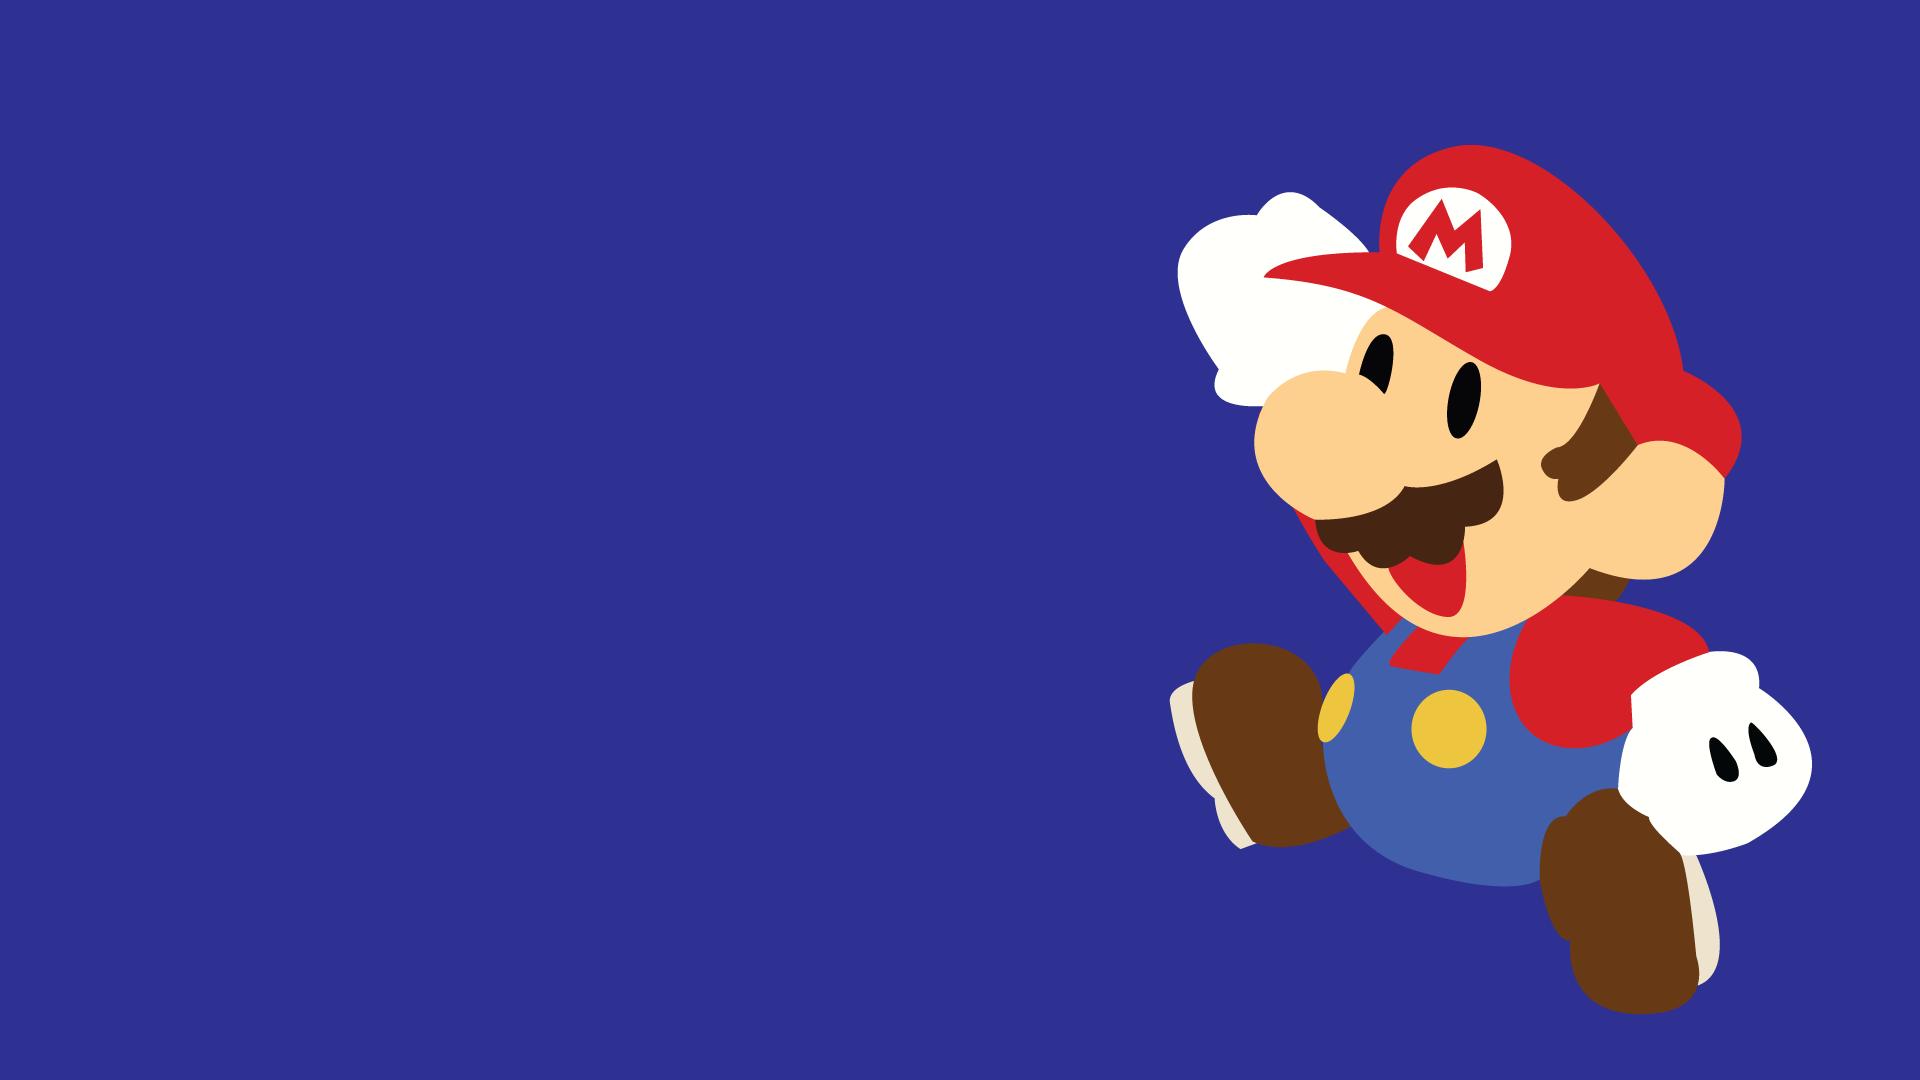 ... Mario Wallpaper ...